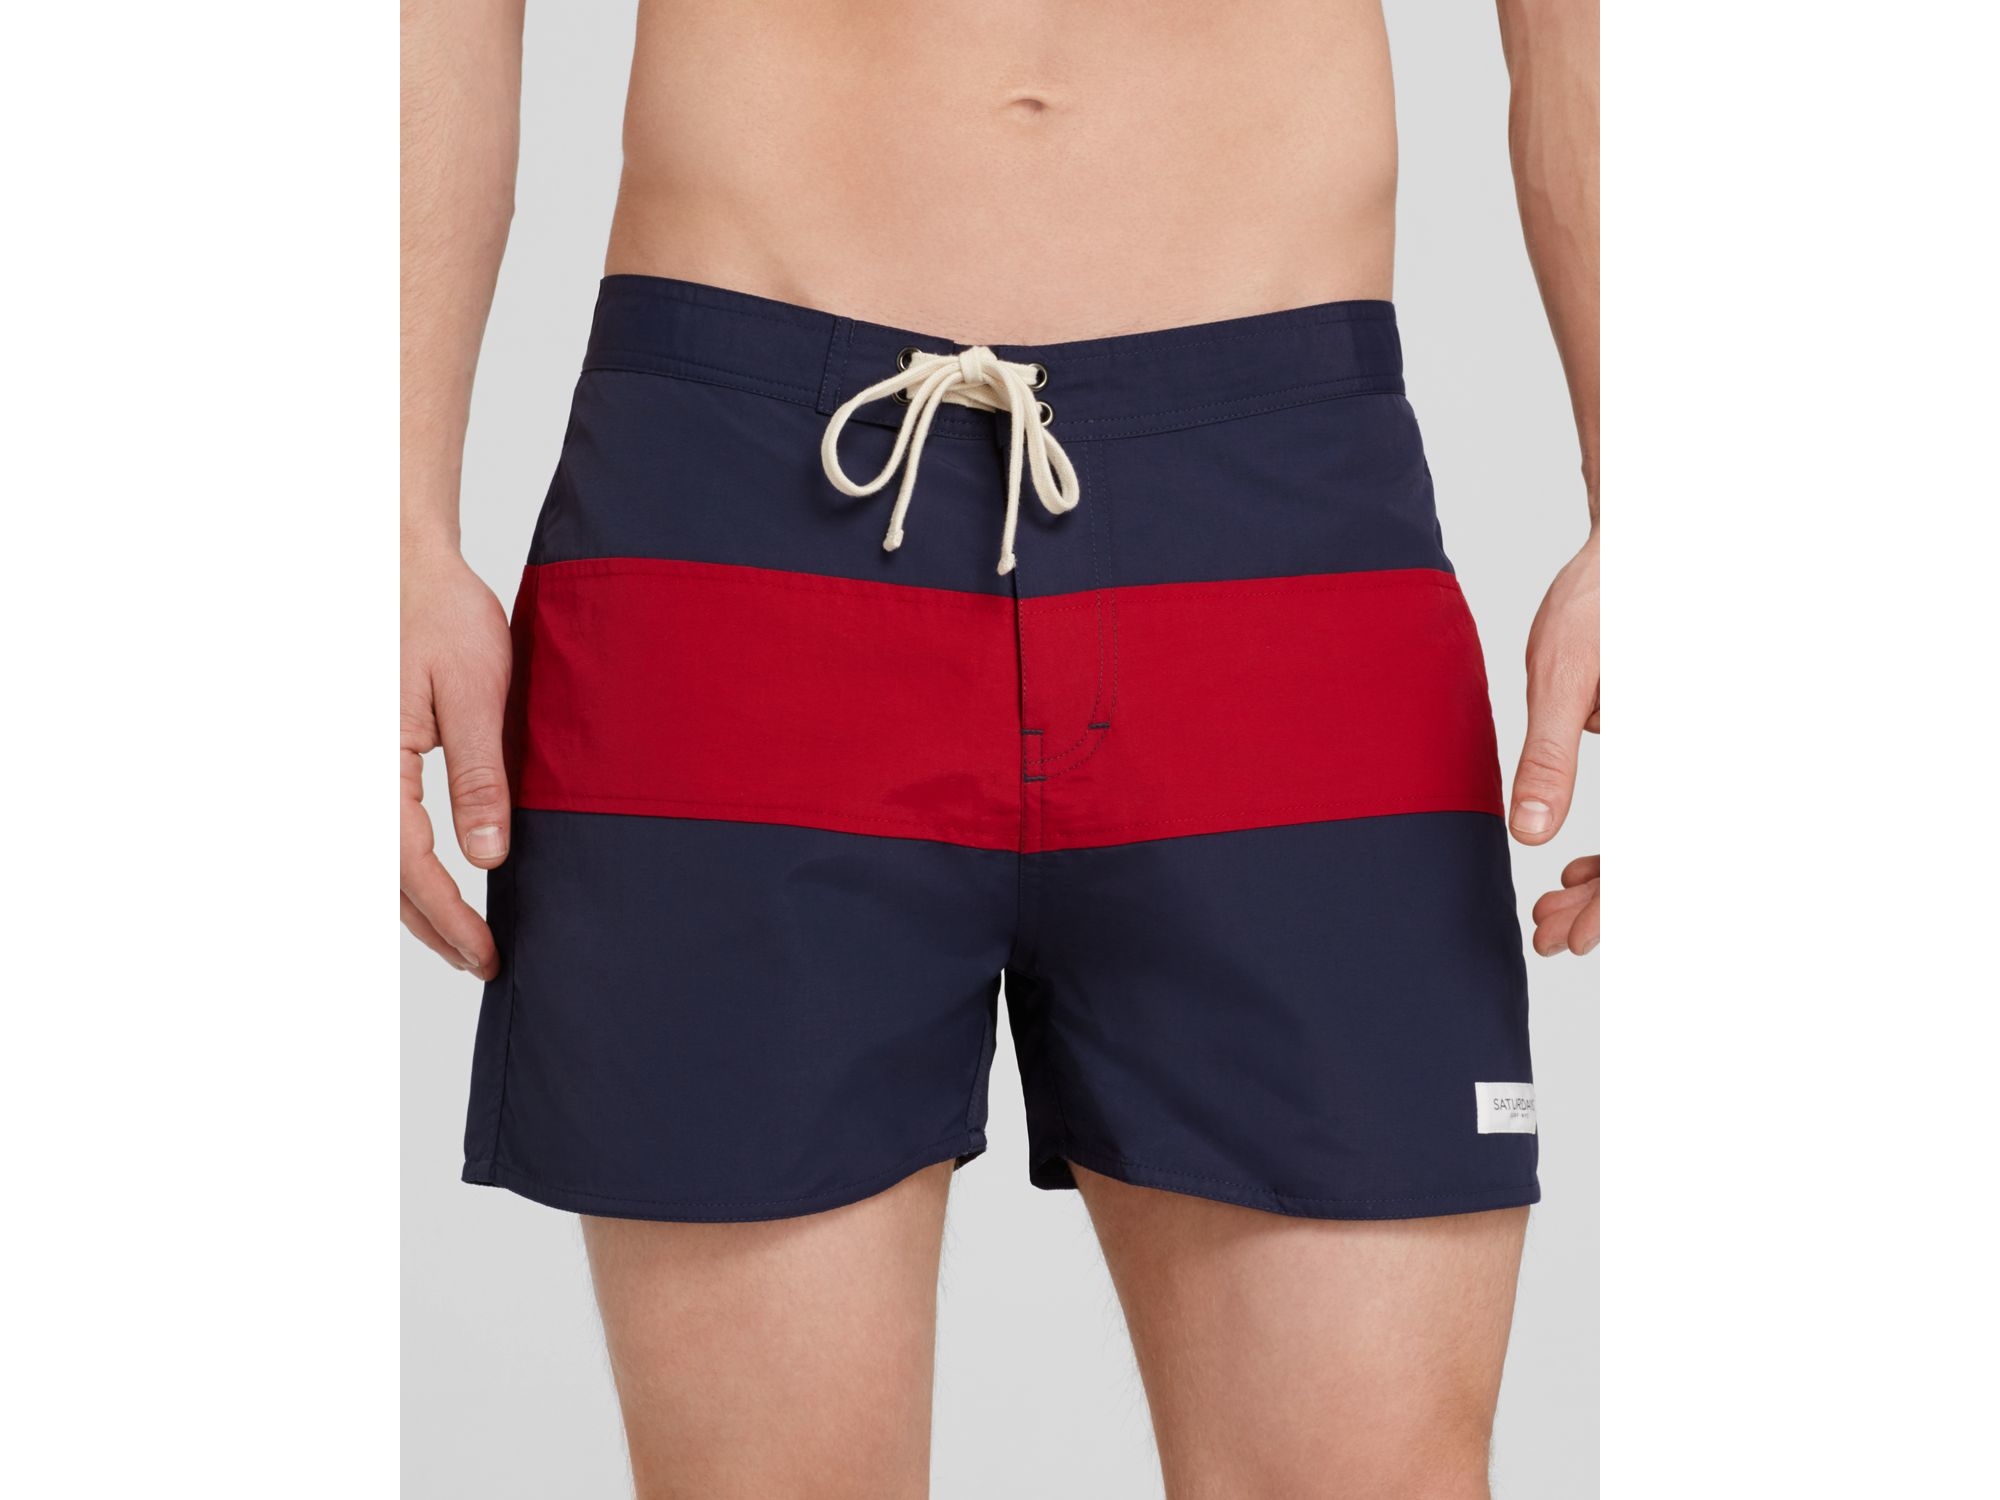 44987677e9 Saturdays NYC Grant Board Shorts in Blue for Men - Lyst